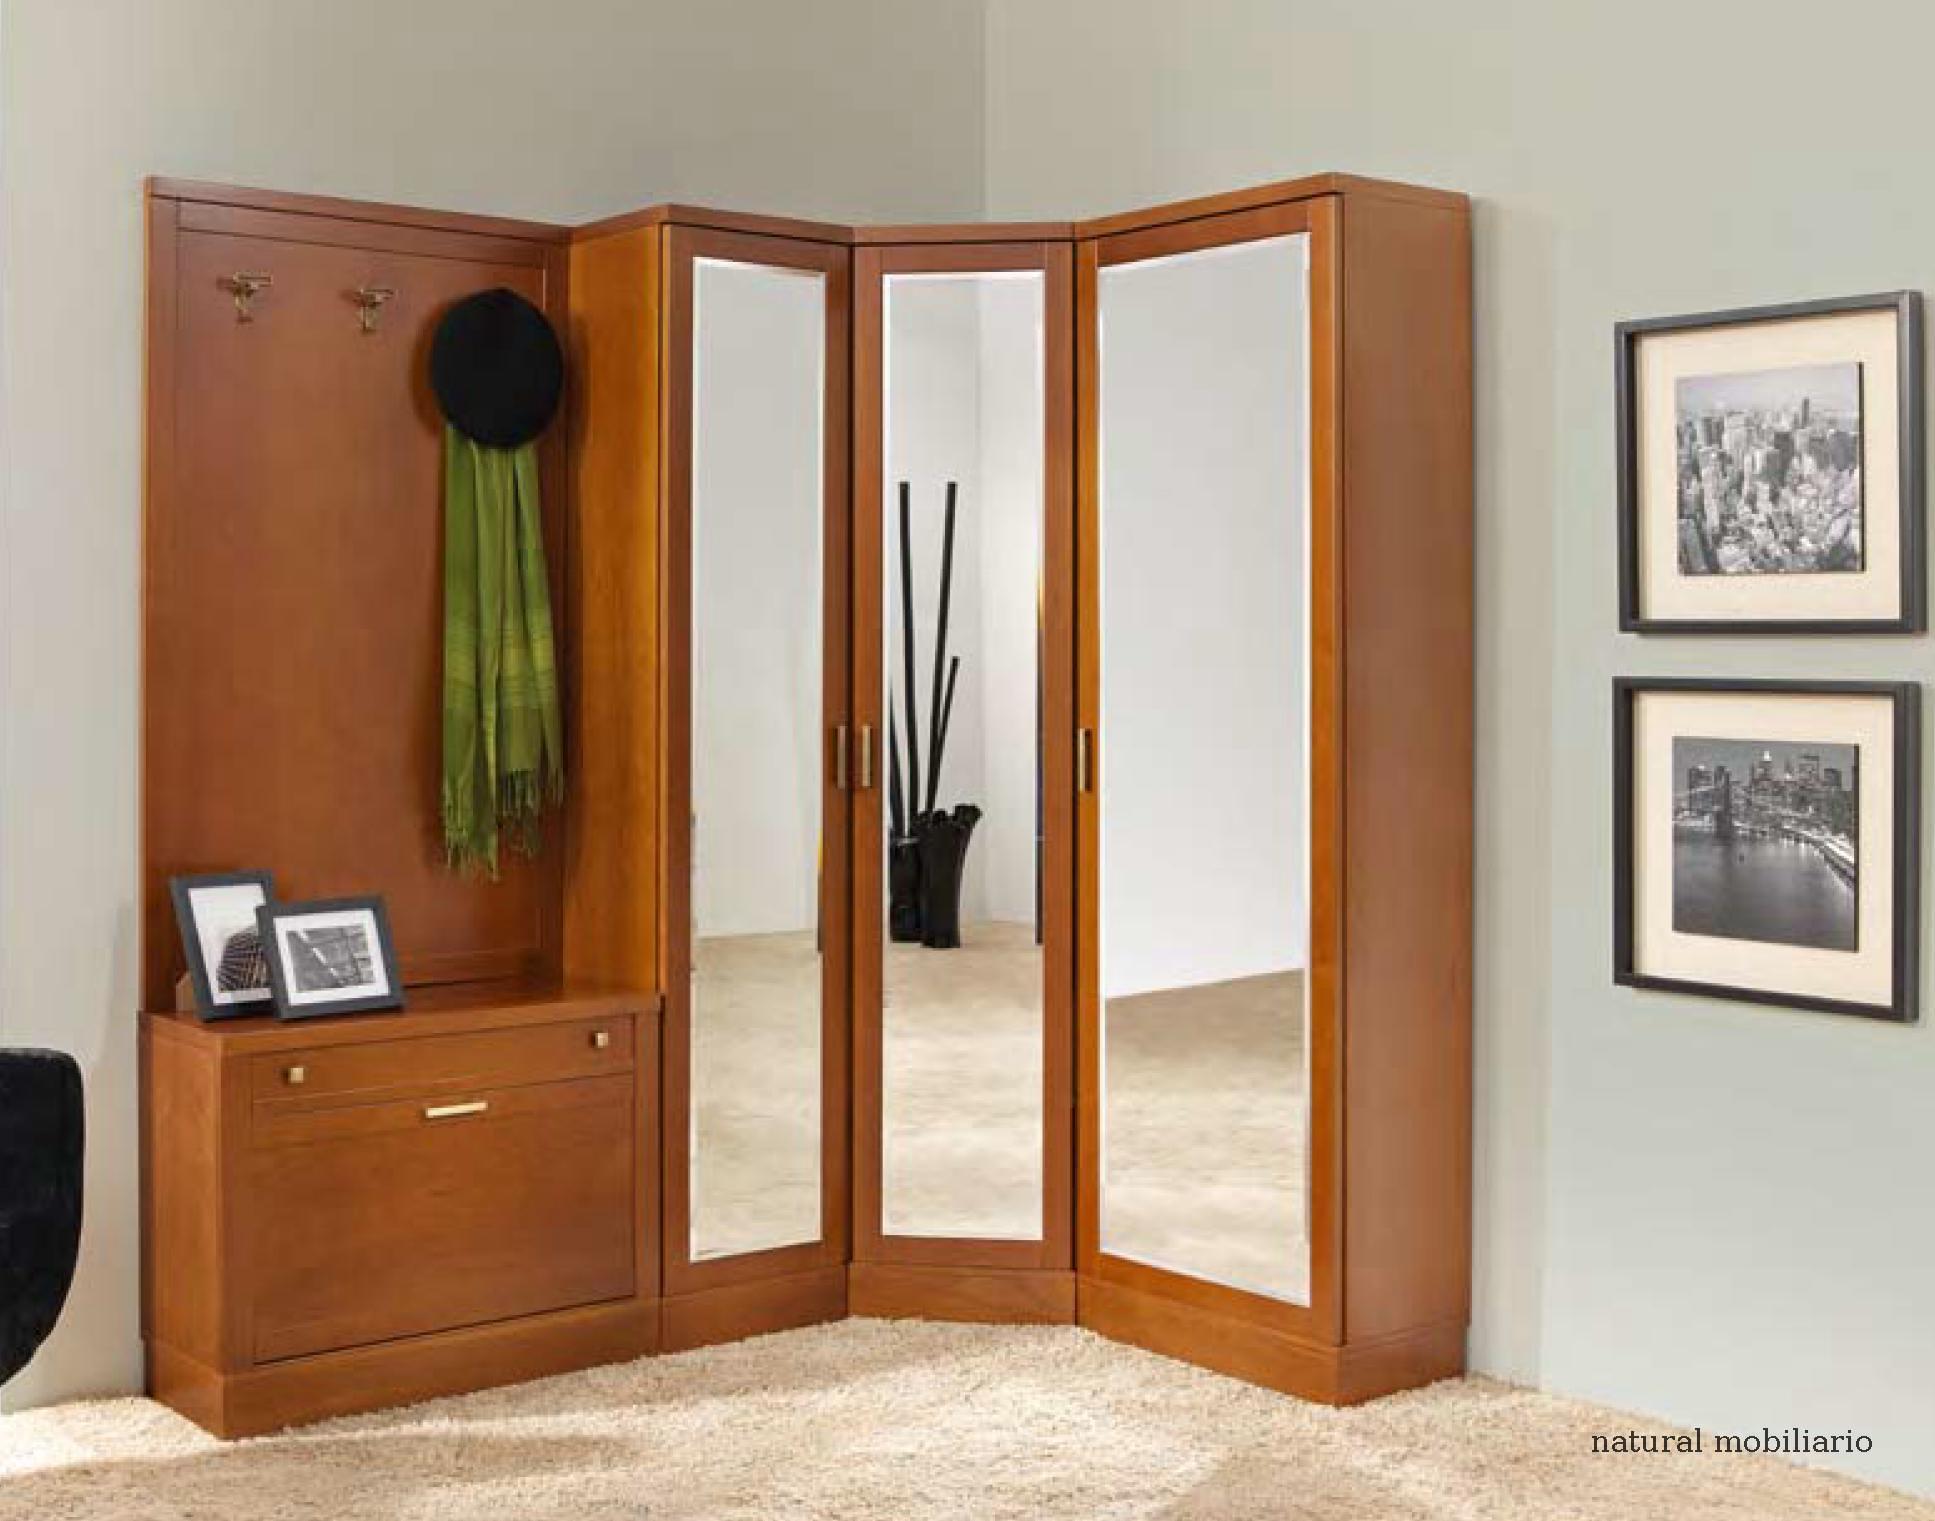 Muebles Recibidores recibidor clasico pana 22-668